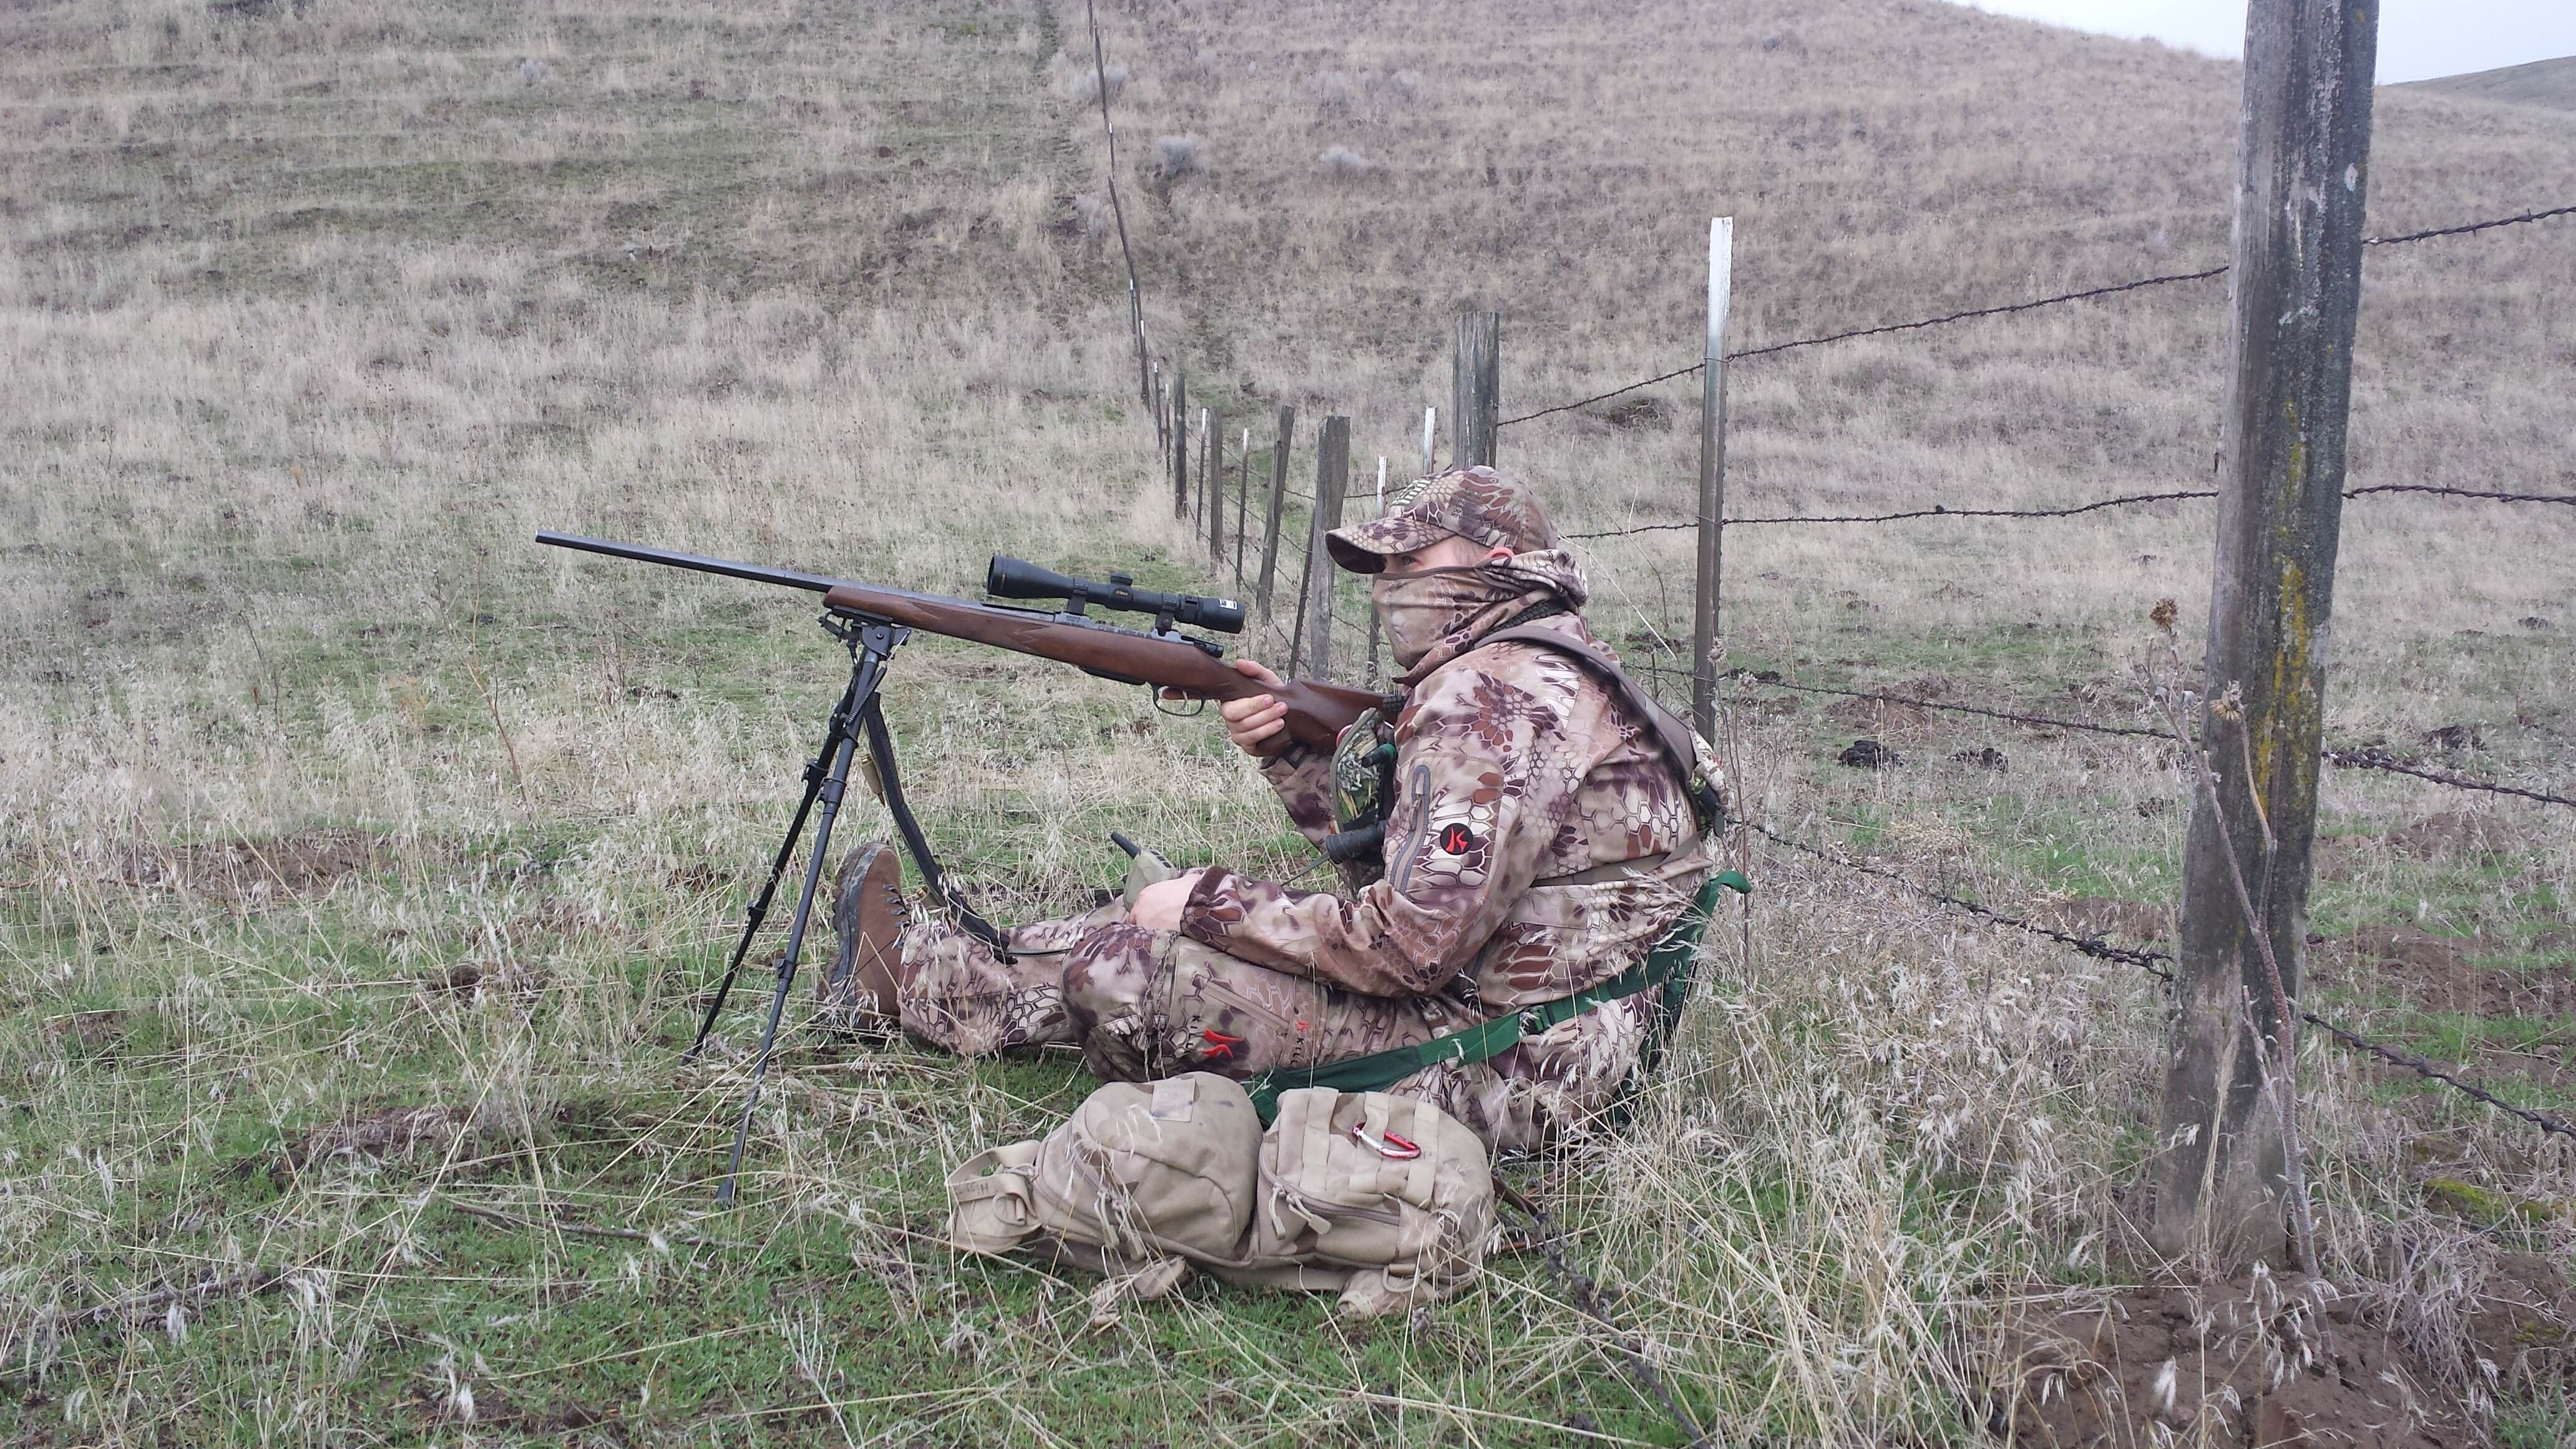 Killik hunting gear Vital Pant, and Nexus Jacket Review ...